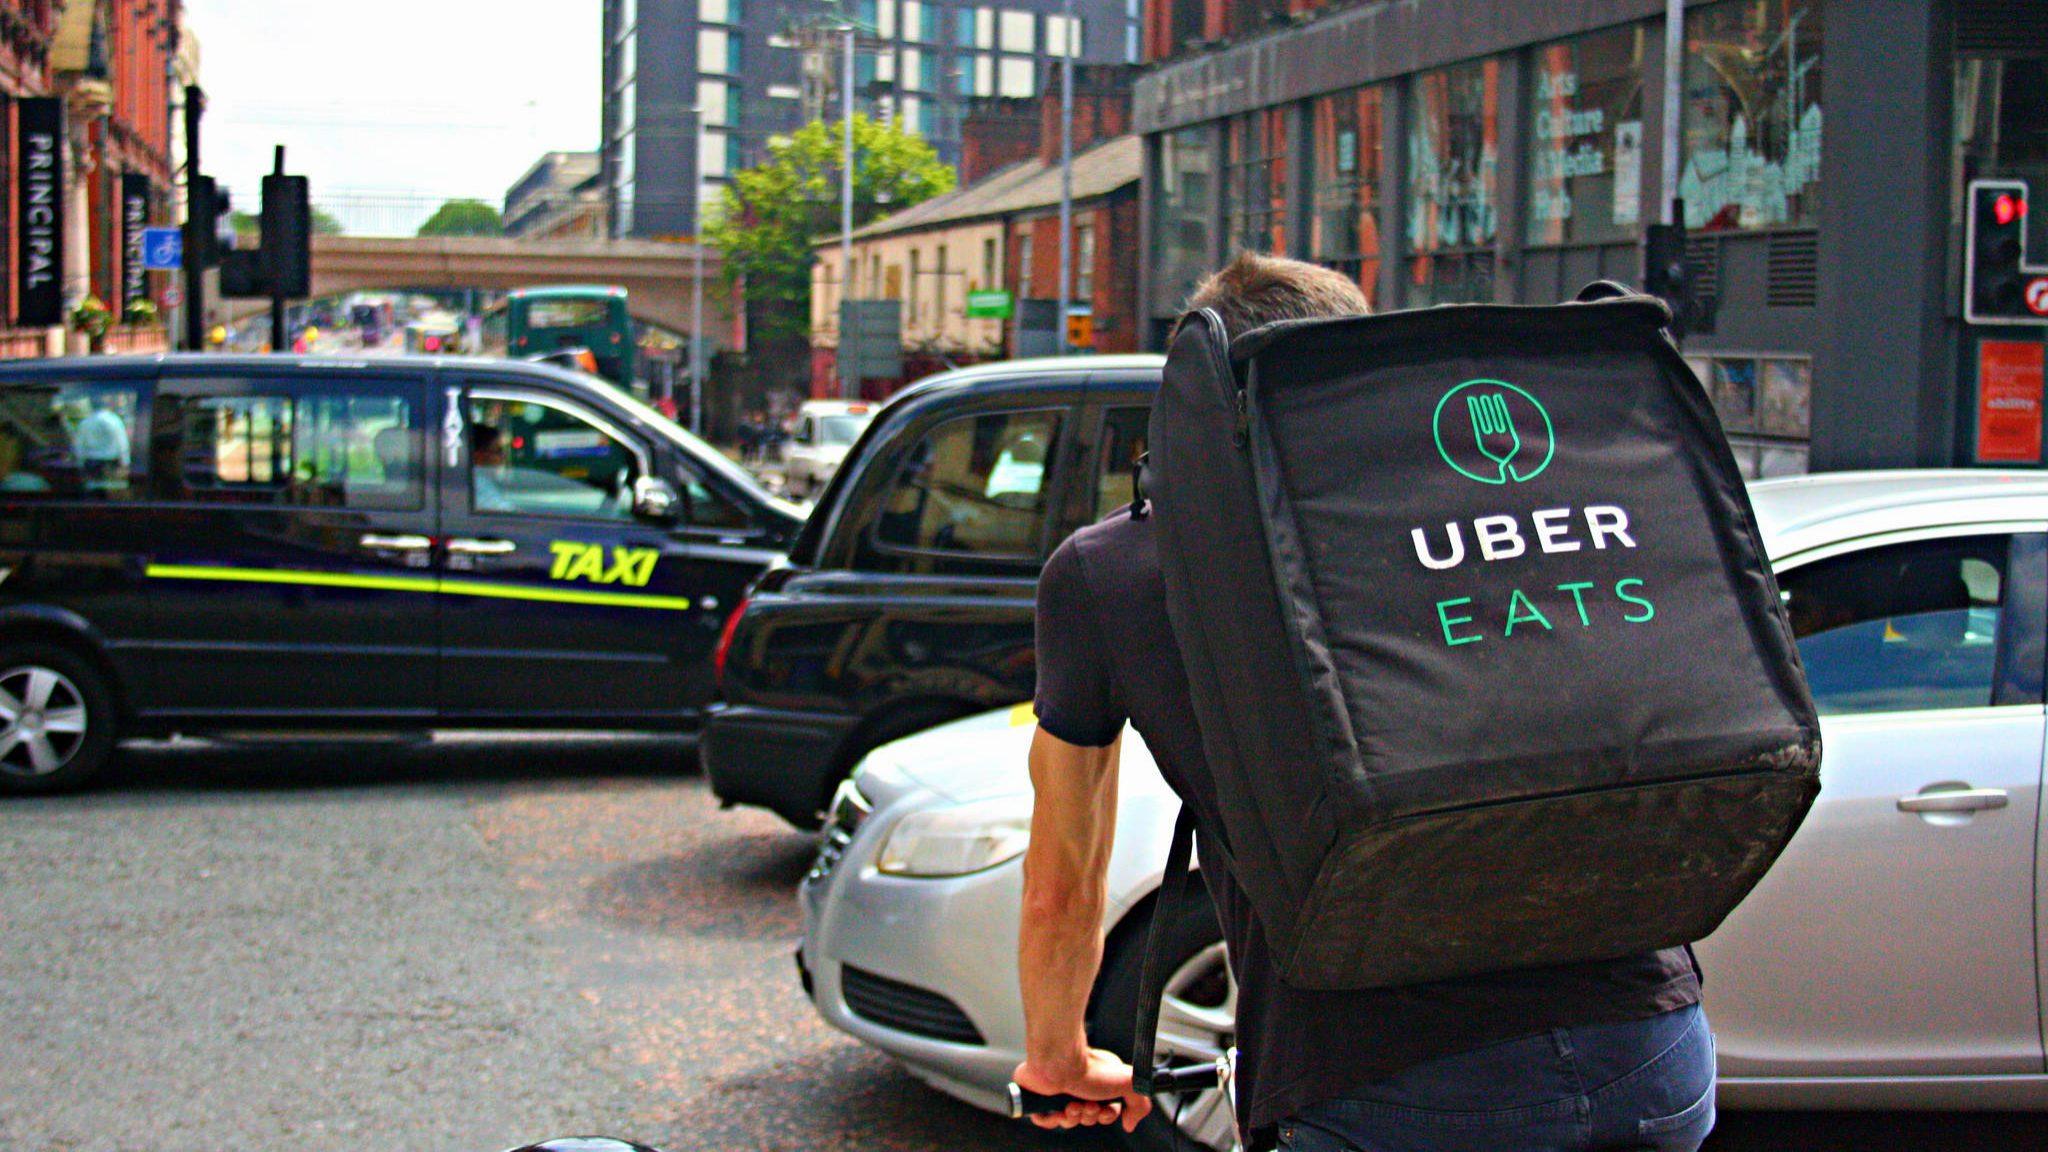 Uber quer dominar o negócio de entrega de comida. Negoceia compra de Deliveroo